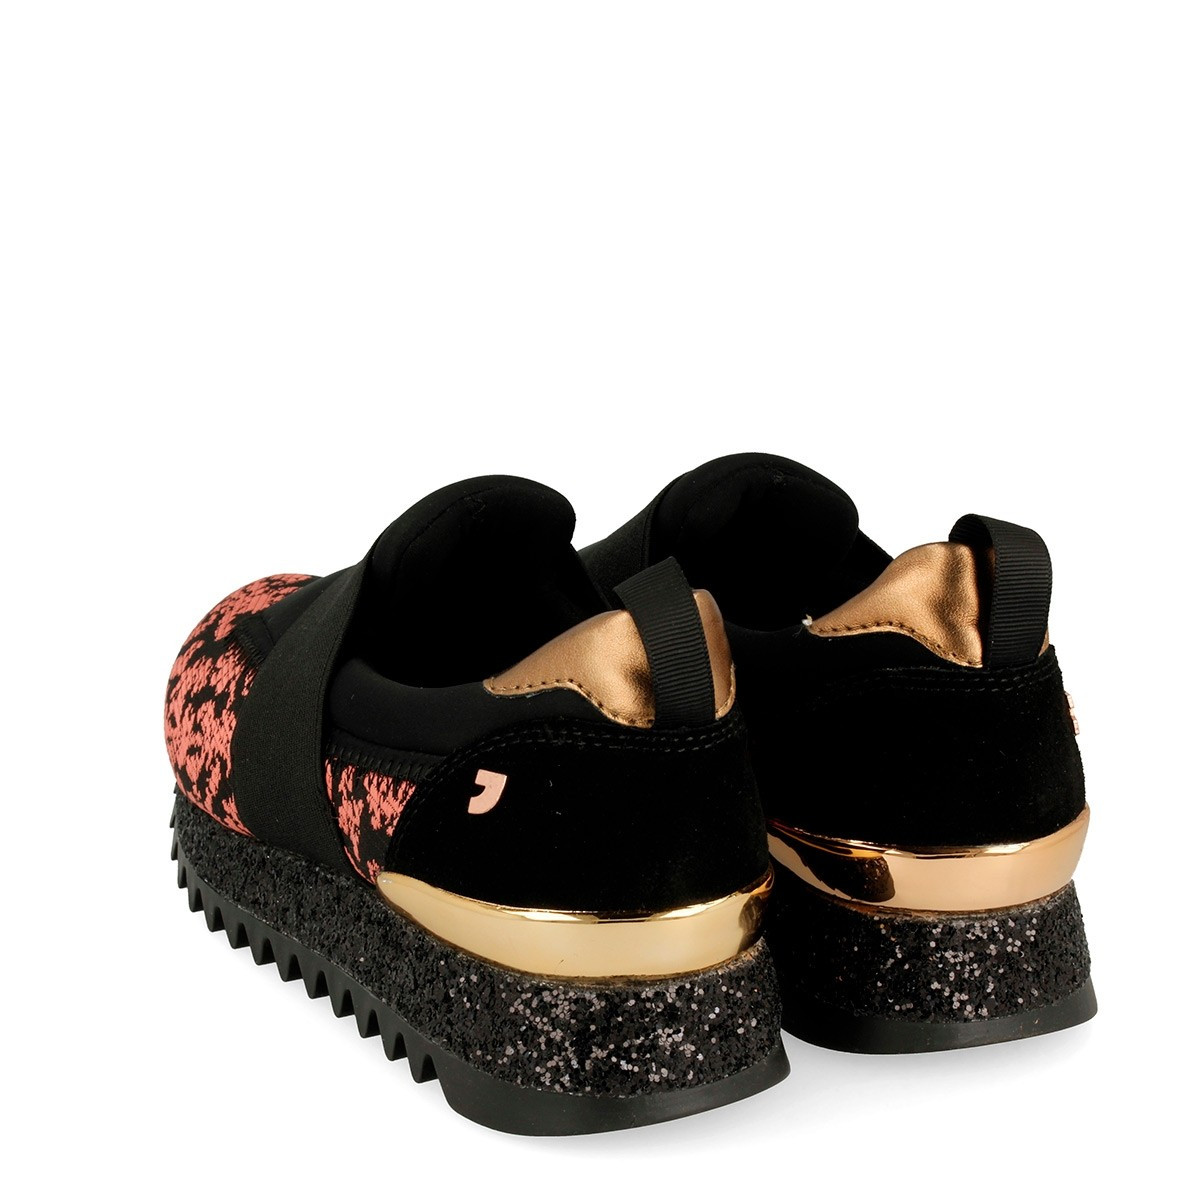 41089 Sneakers gioseppo coral